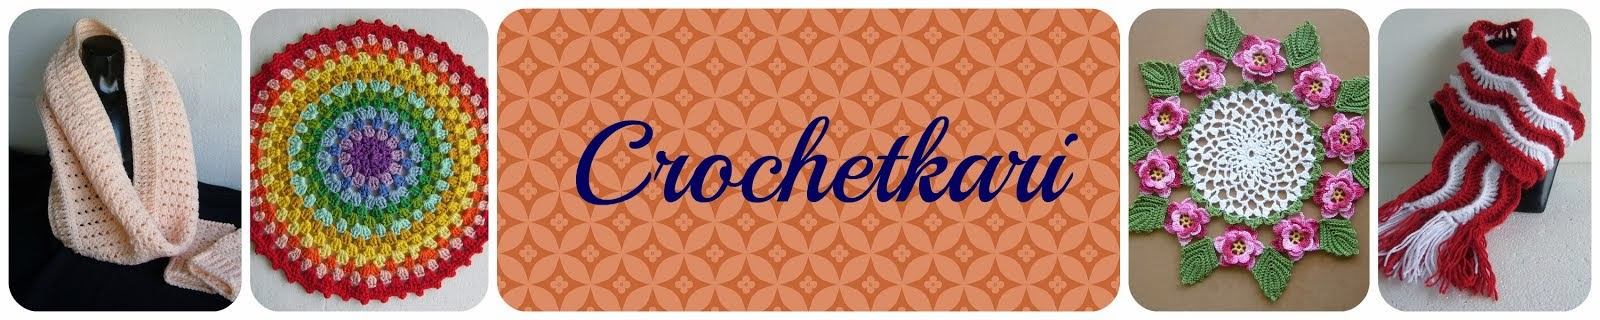 Crochetkari